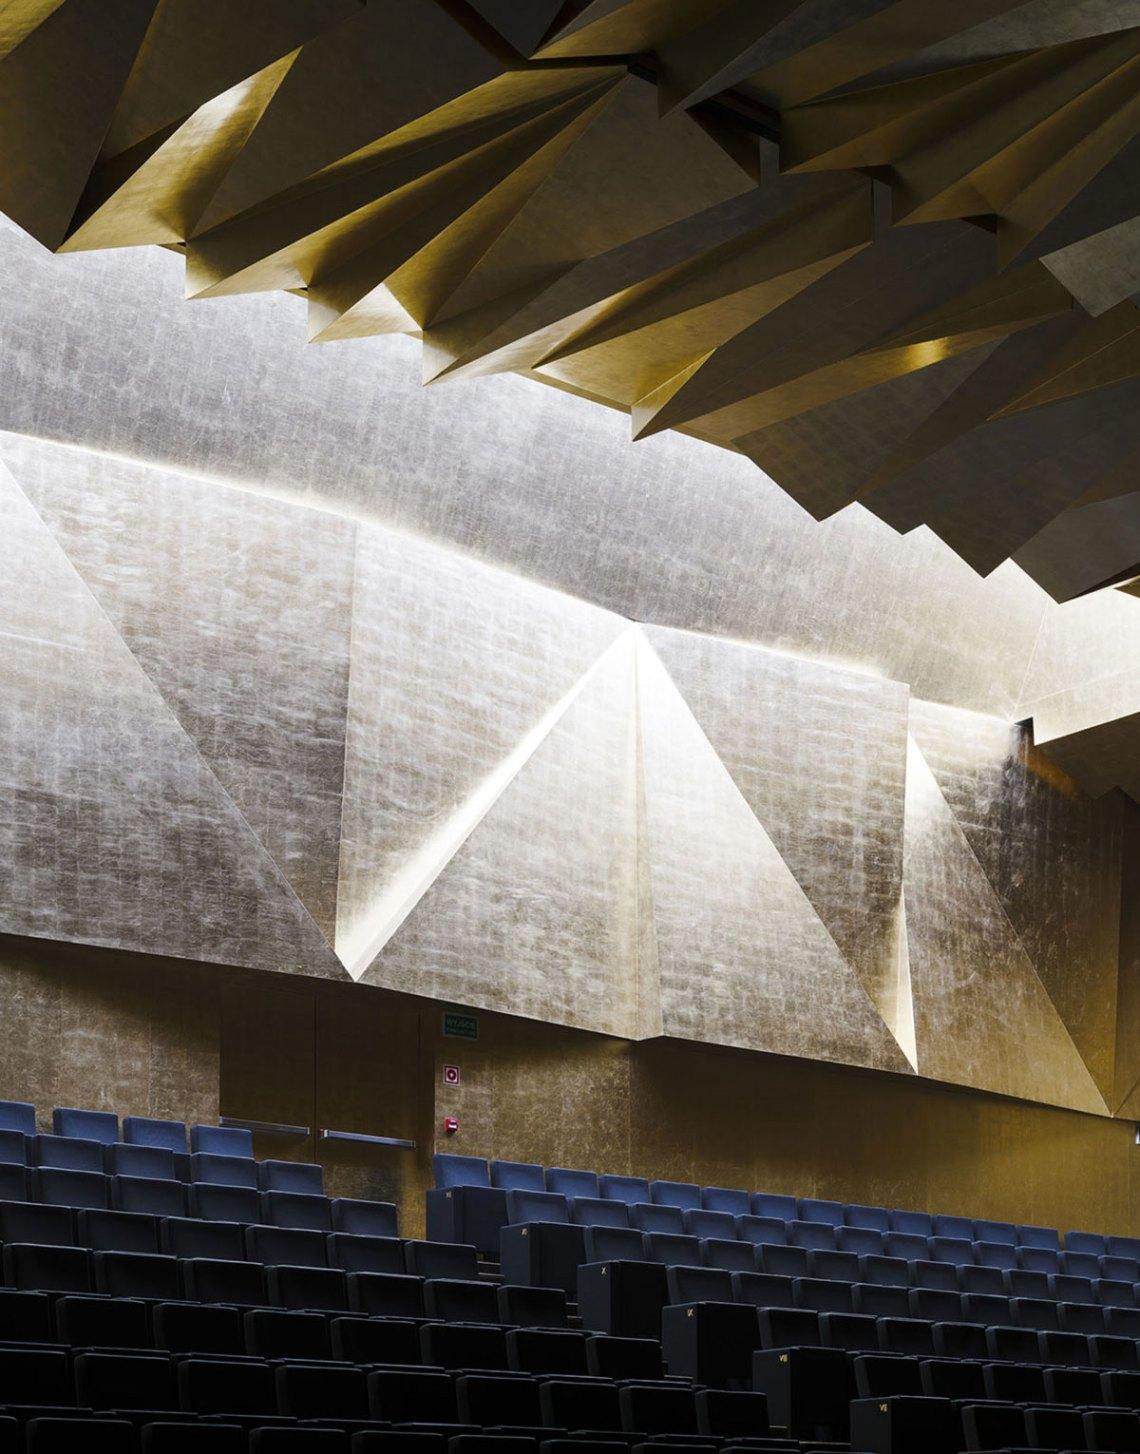 Philharmonic Hall Szczecin / Estudio Barozzi Veiga